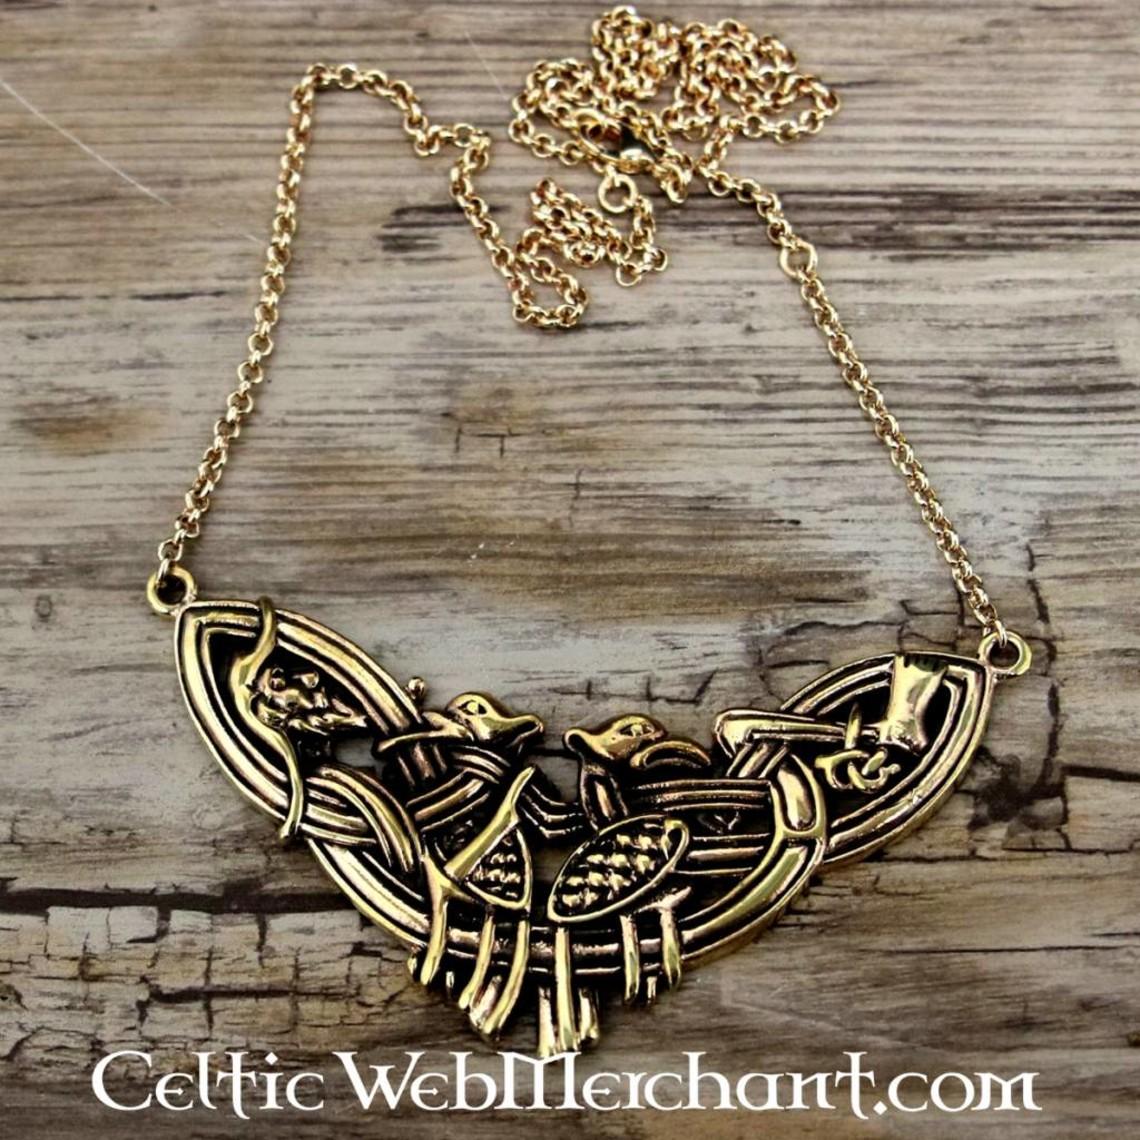 Irish Book of Kells catena